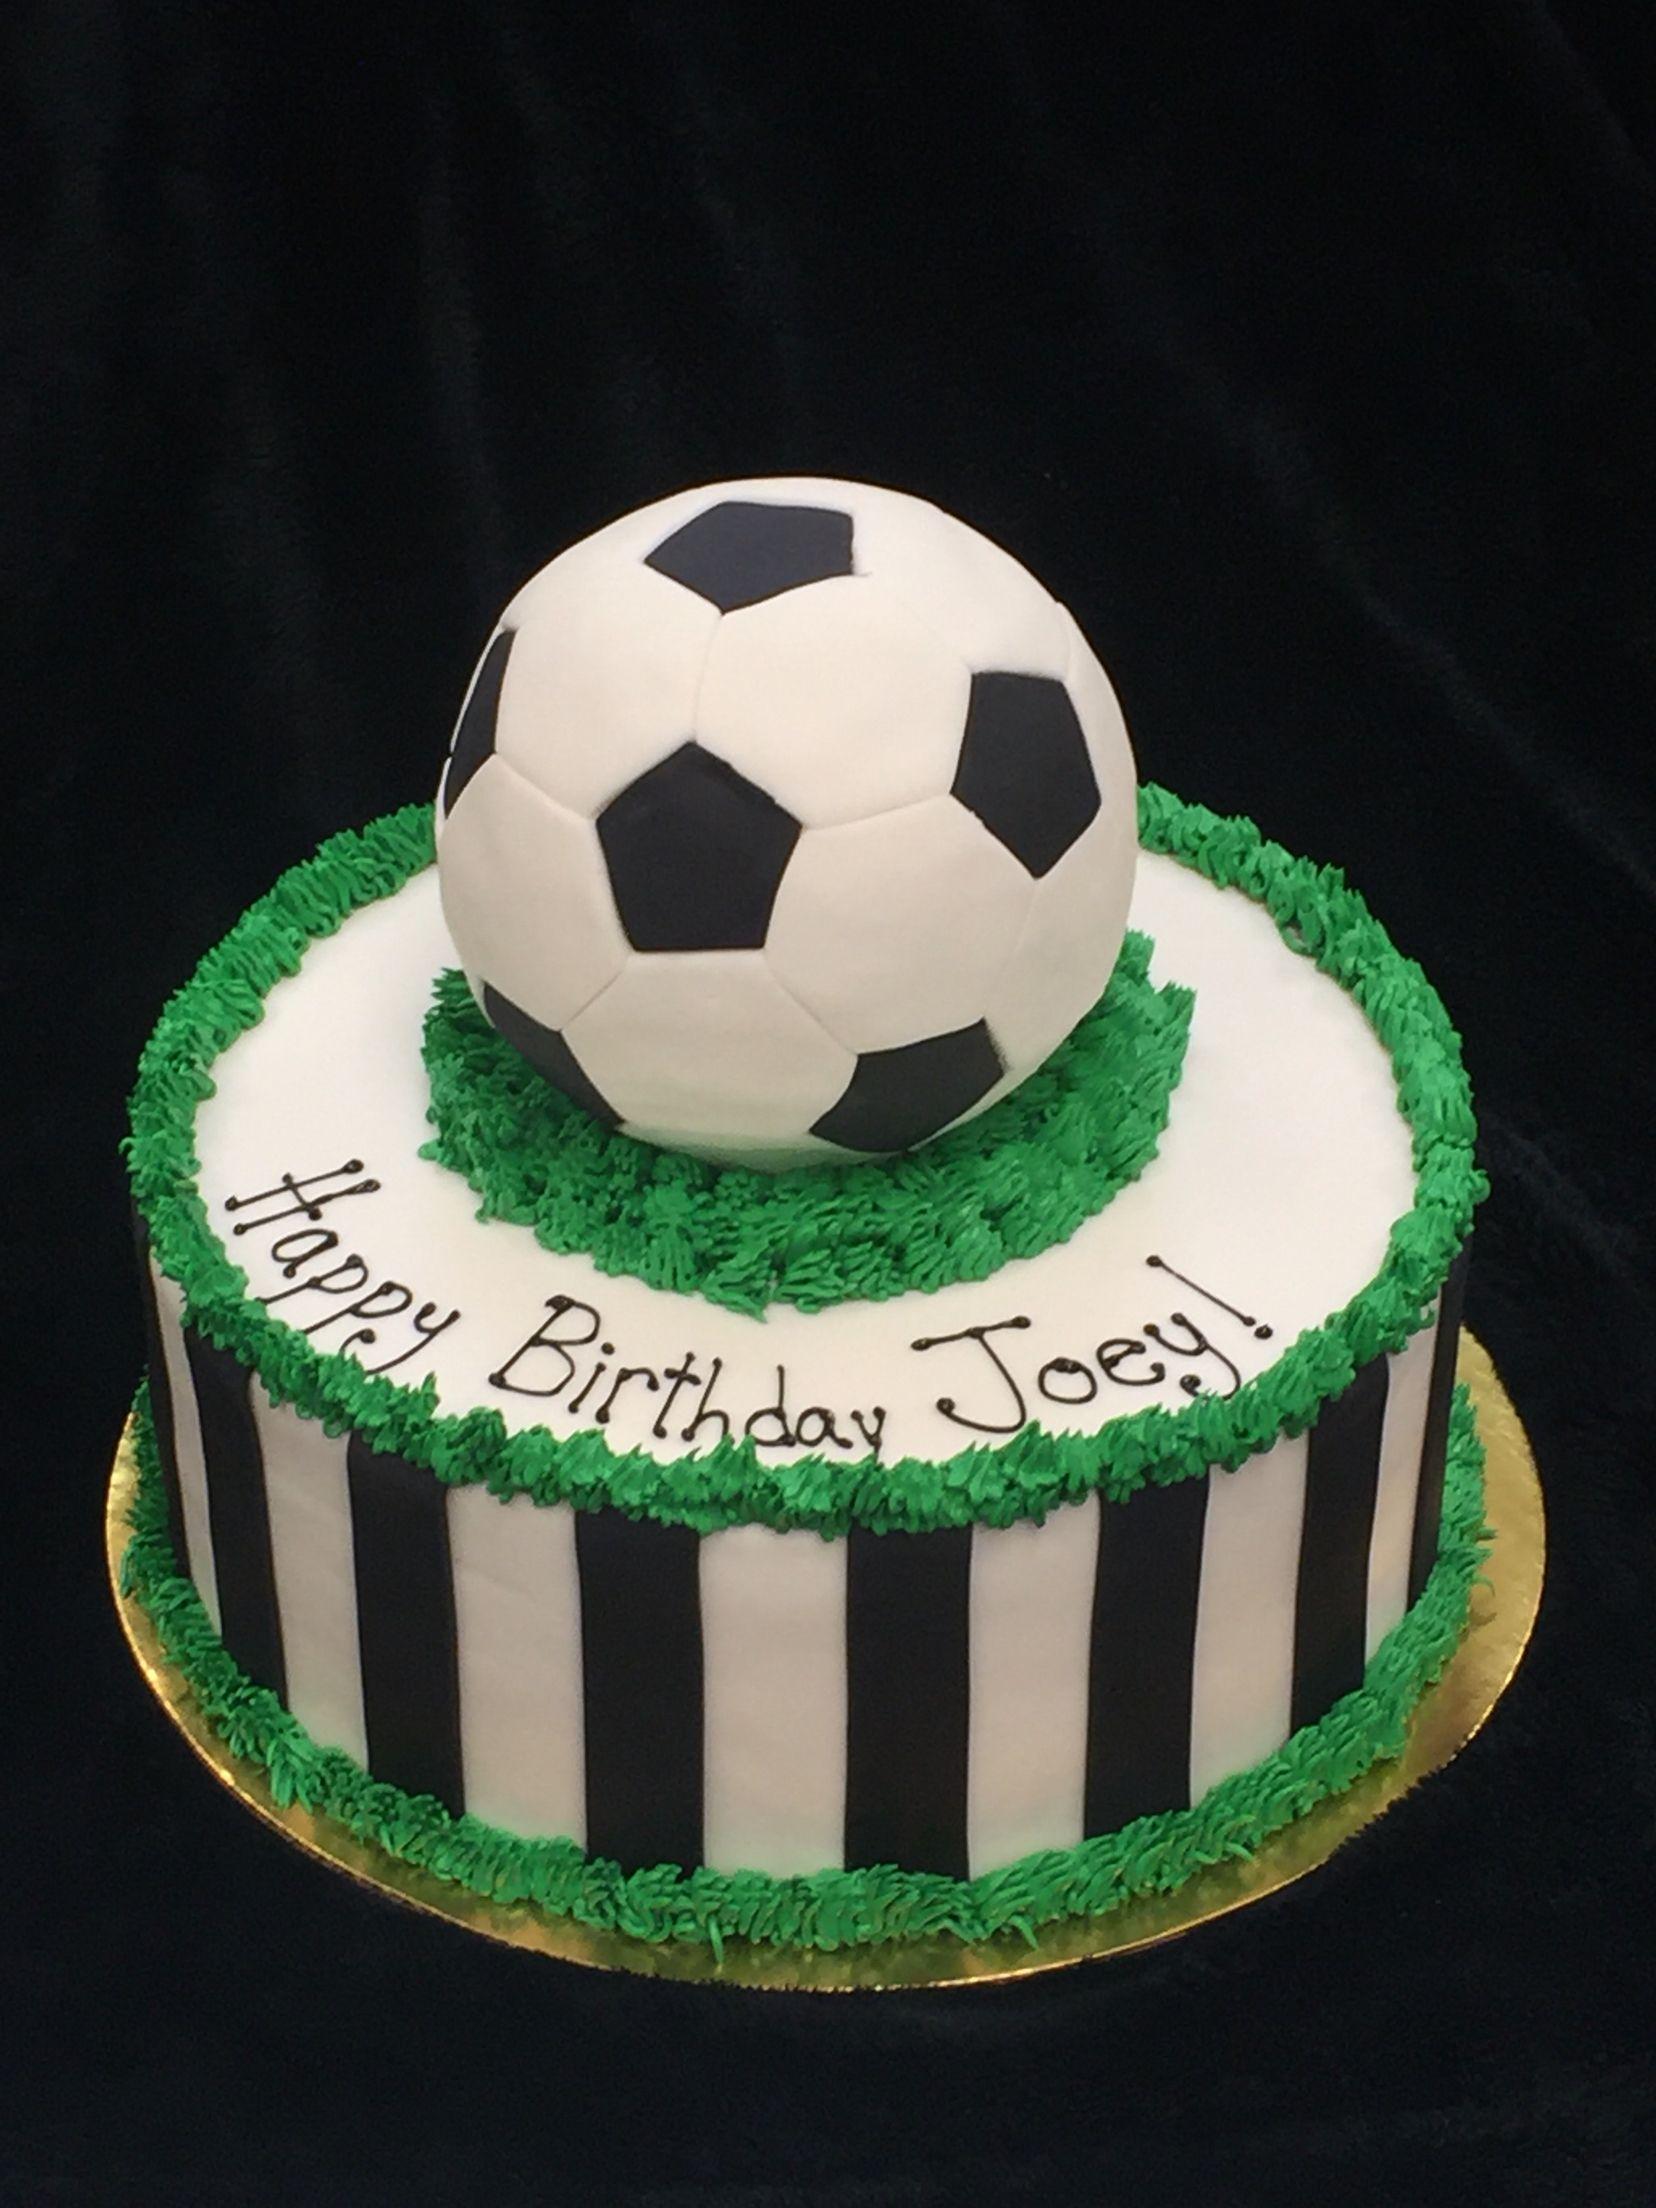 Tremendous Soccer Theme Birthday Soccer Birthday Cakes Soccer Birthday Personalised Birthday Cards Paralily Jamesorg